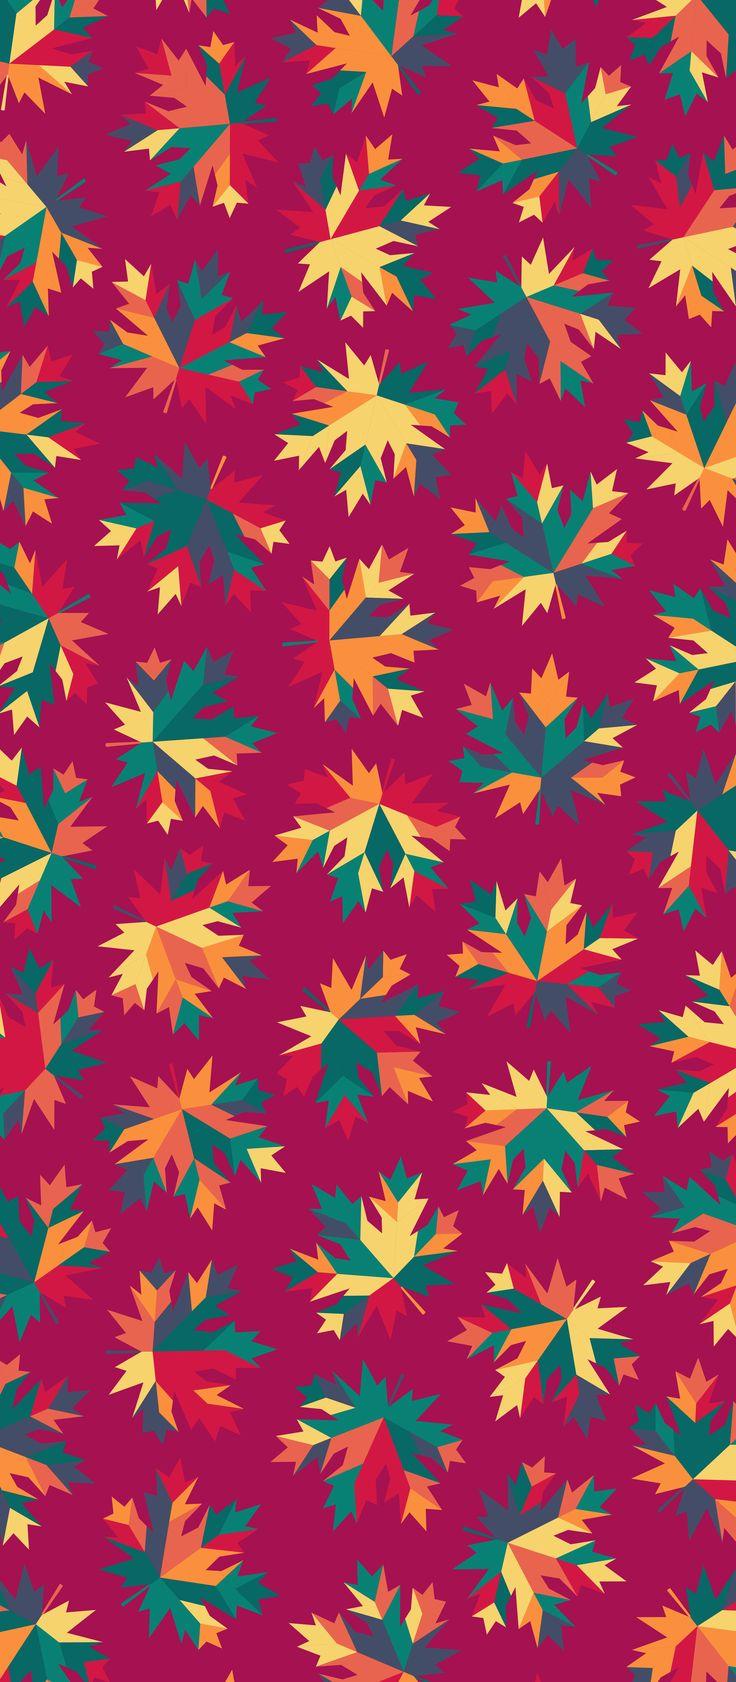 Russfussuk 'Sharp Maple' Pattern M3A #pattern #patterndesign #patternprint #maple #autumn #fall #leaf #leaves #generative #otoño #cadernos #padrões